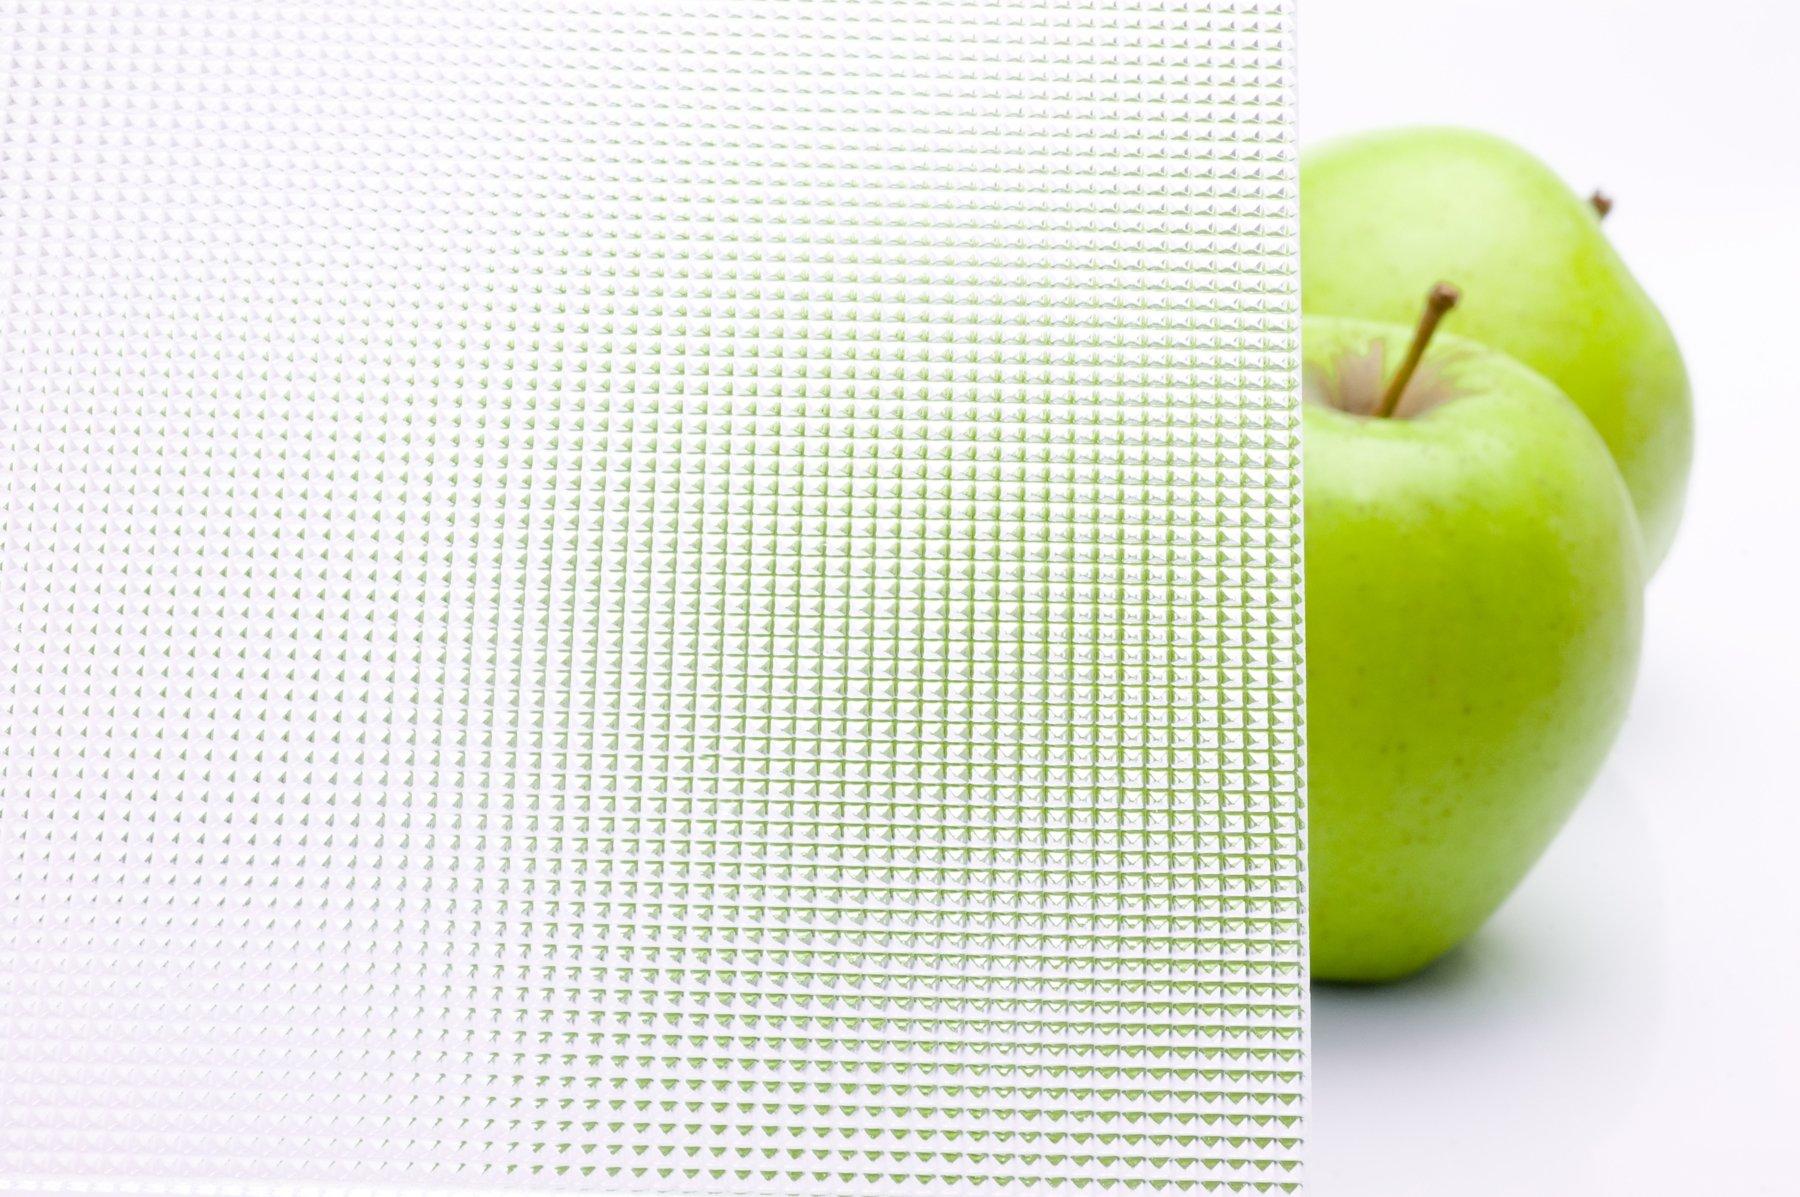 Kunststofffenster kellerfenster fenster mit griff 2 fach verglasung roto ebay for Kunststofffenster kellerfenster